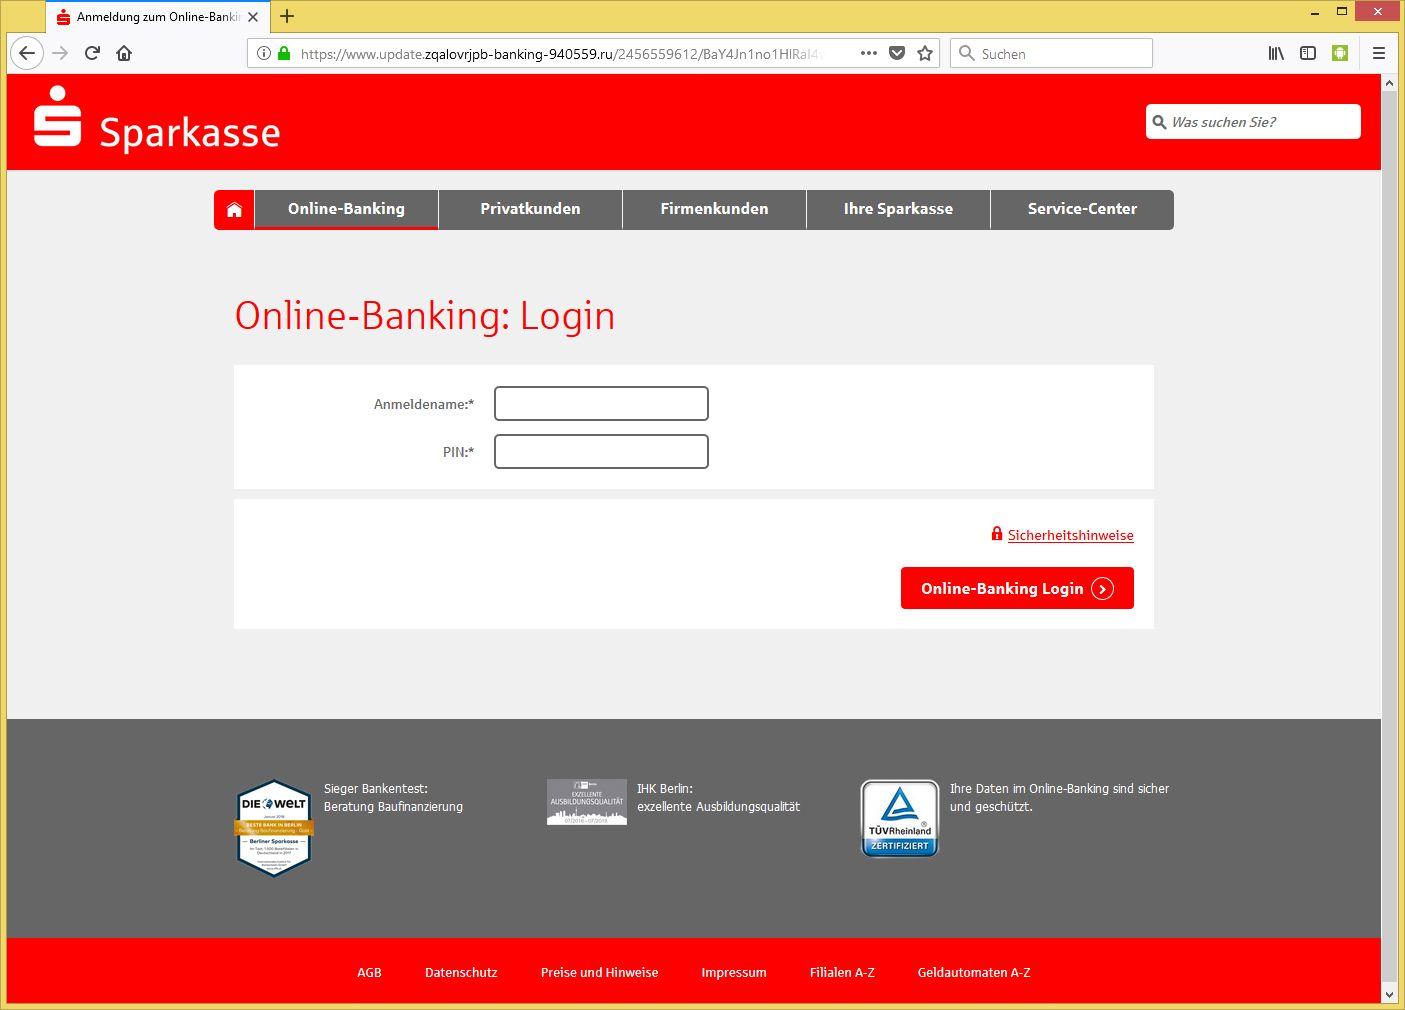 ostseesparkasse online banking login